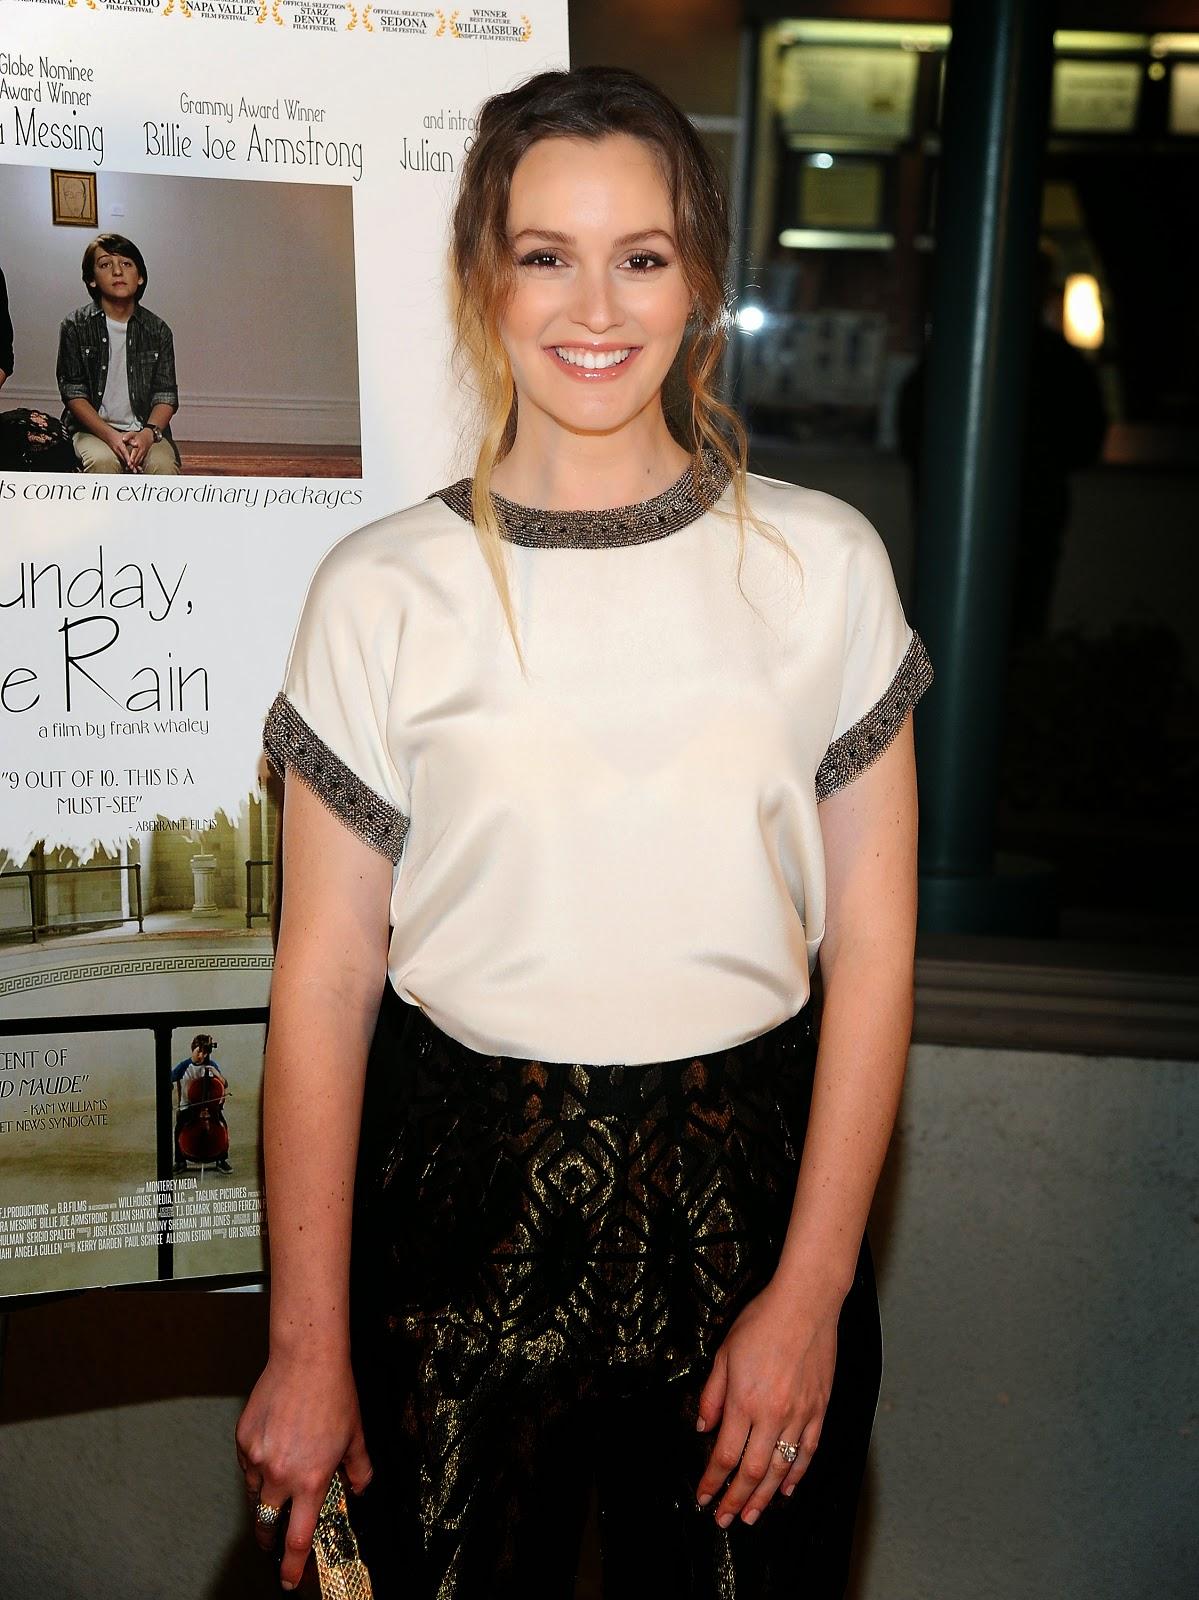 Leighton Meester at the Premiere of 'Like Sunday, Like Rain'